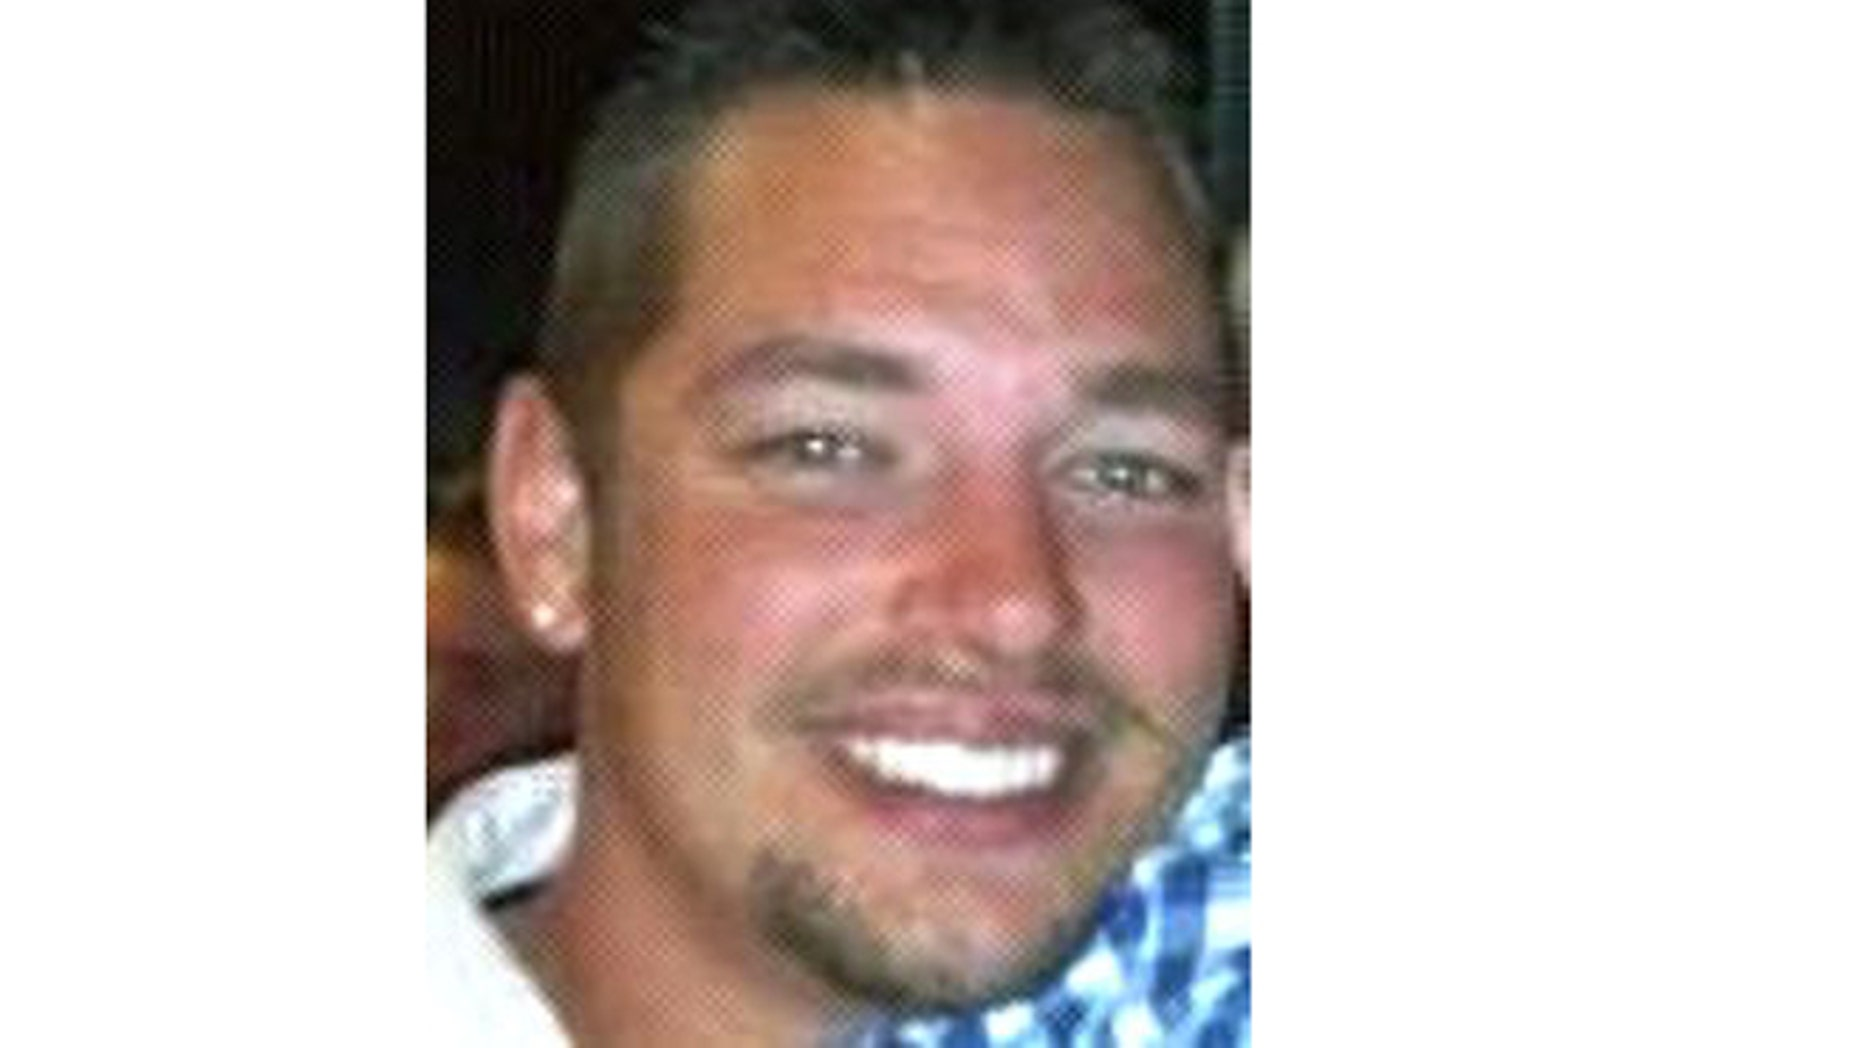 Brandon Lawson disappeared in 2013.